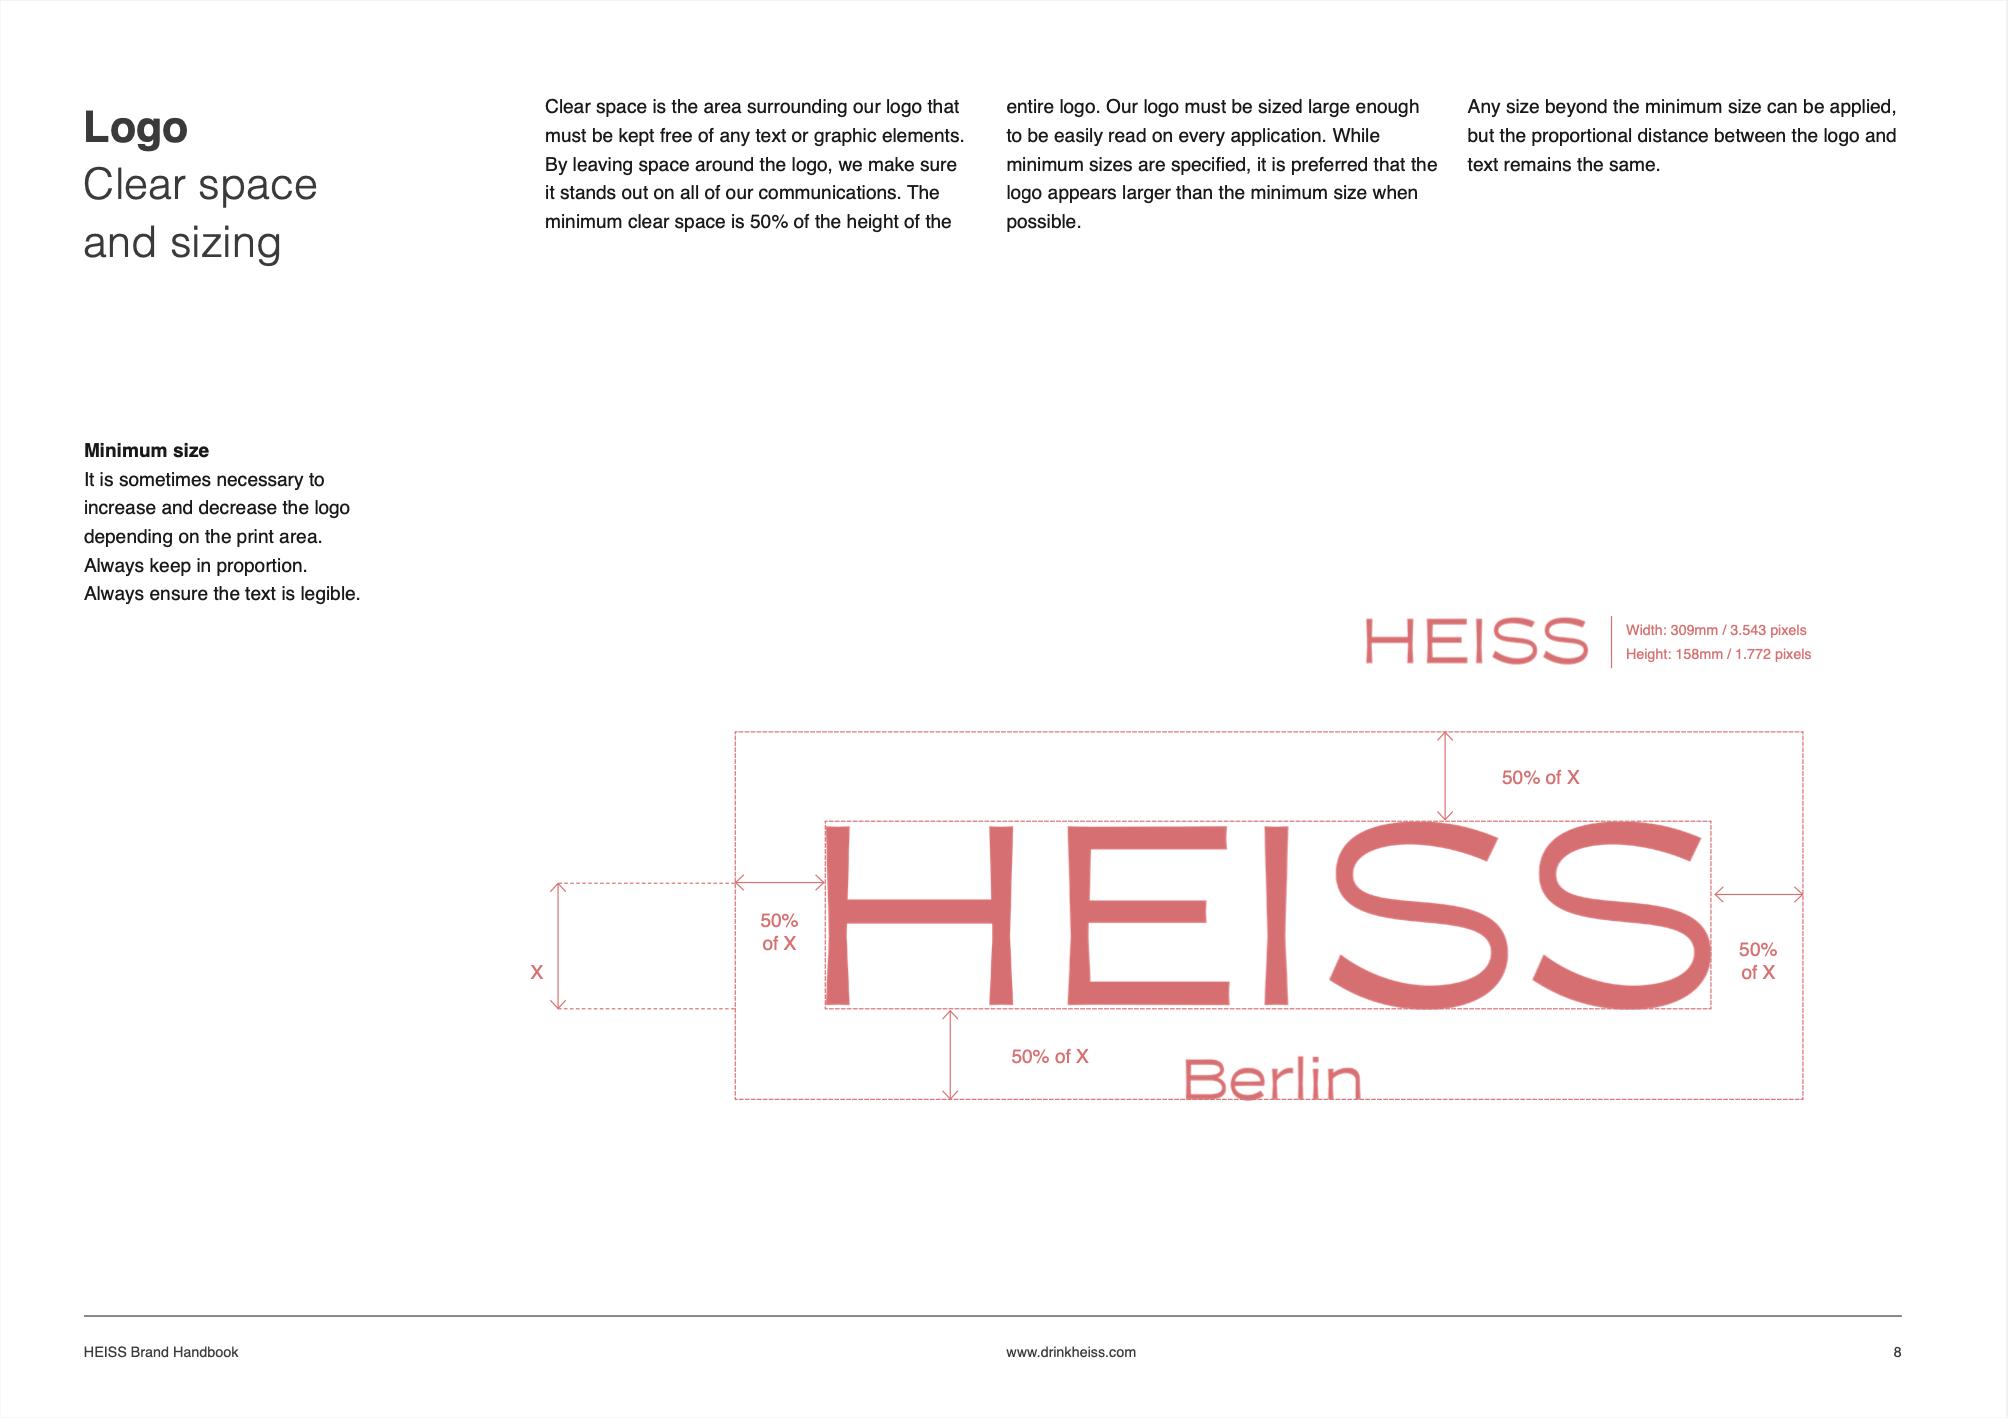 HEISS-Website-Goudefroy-8